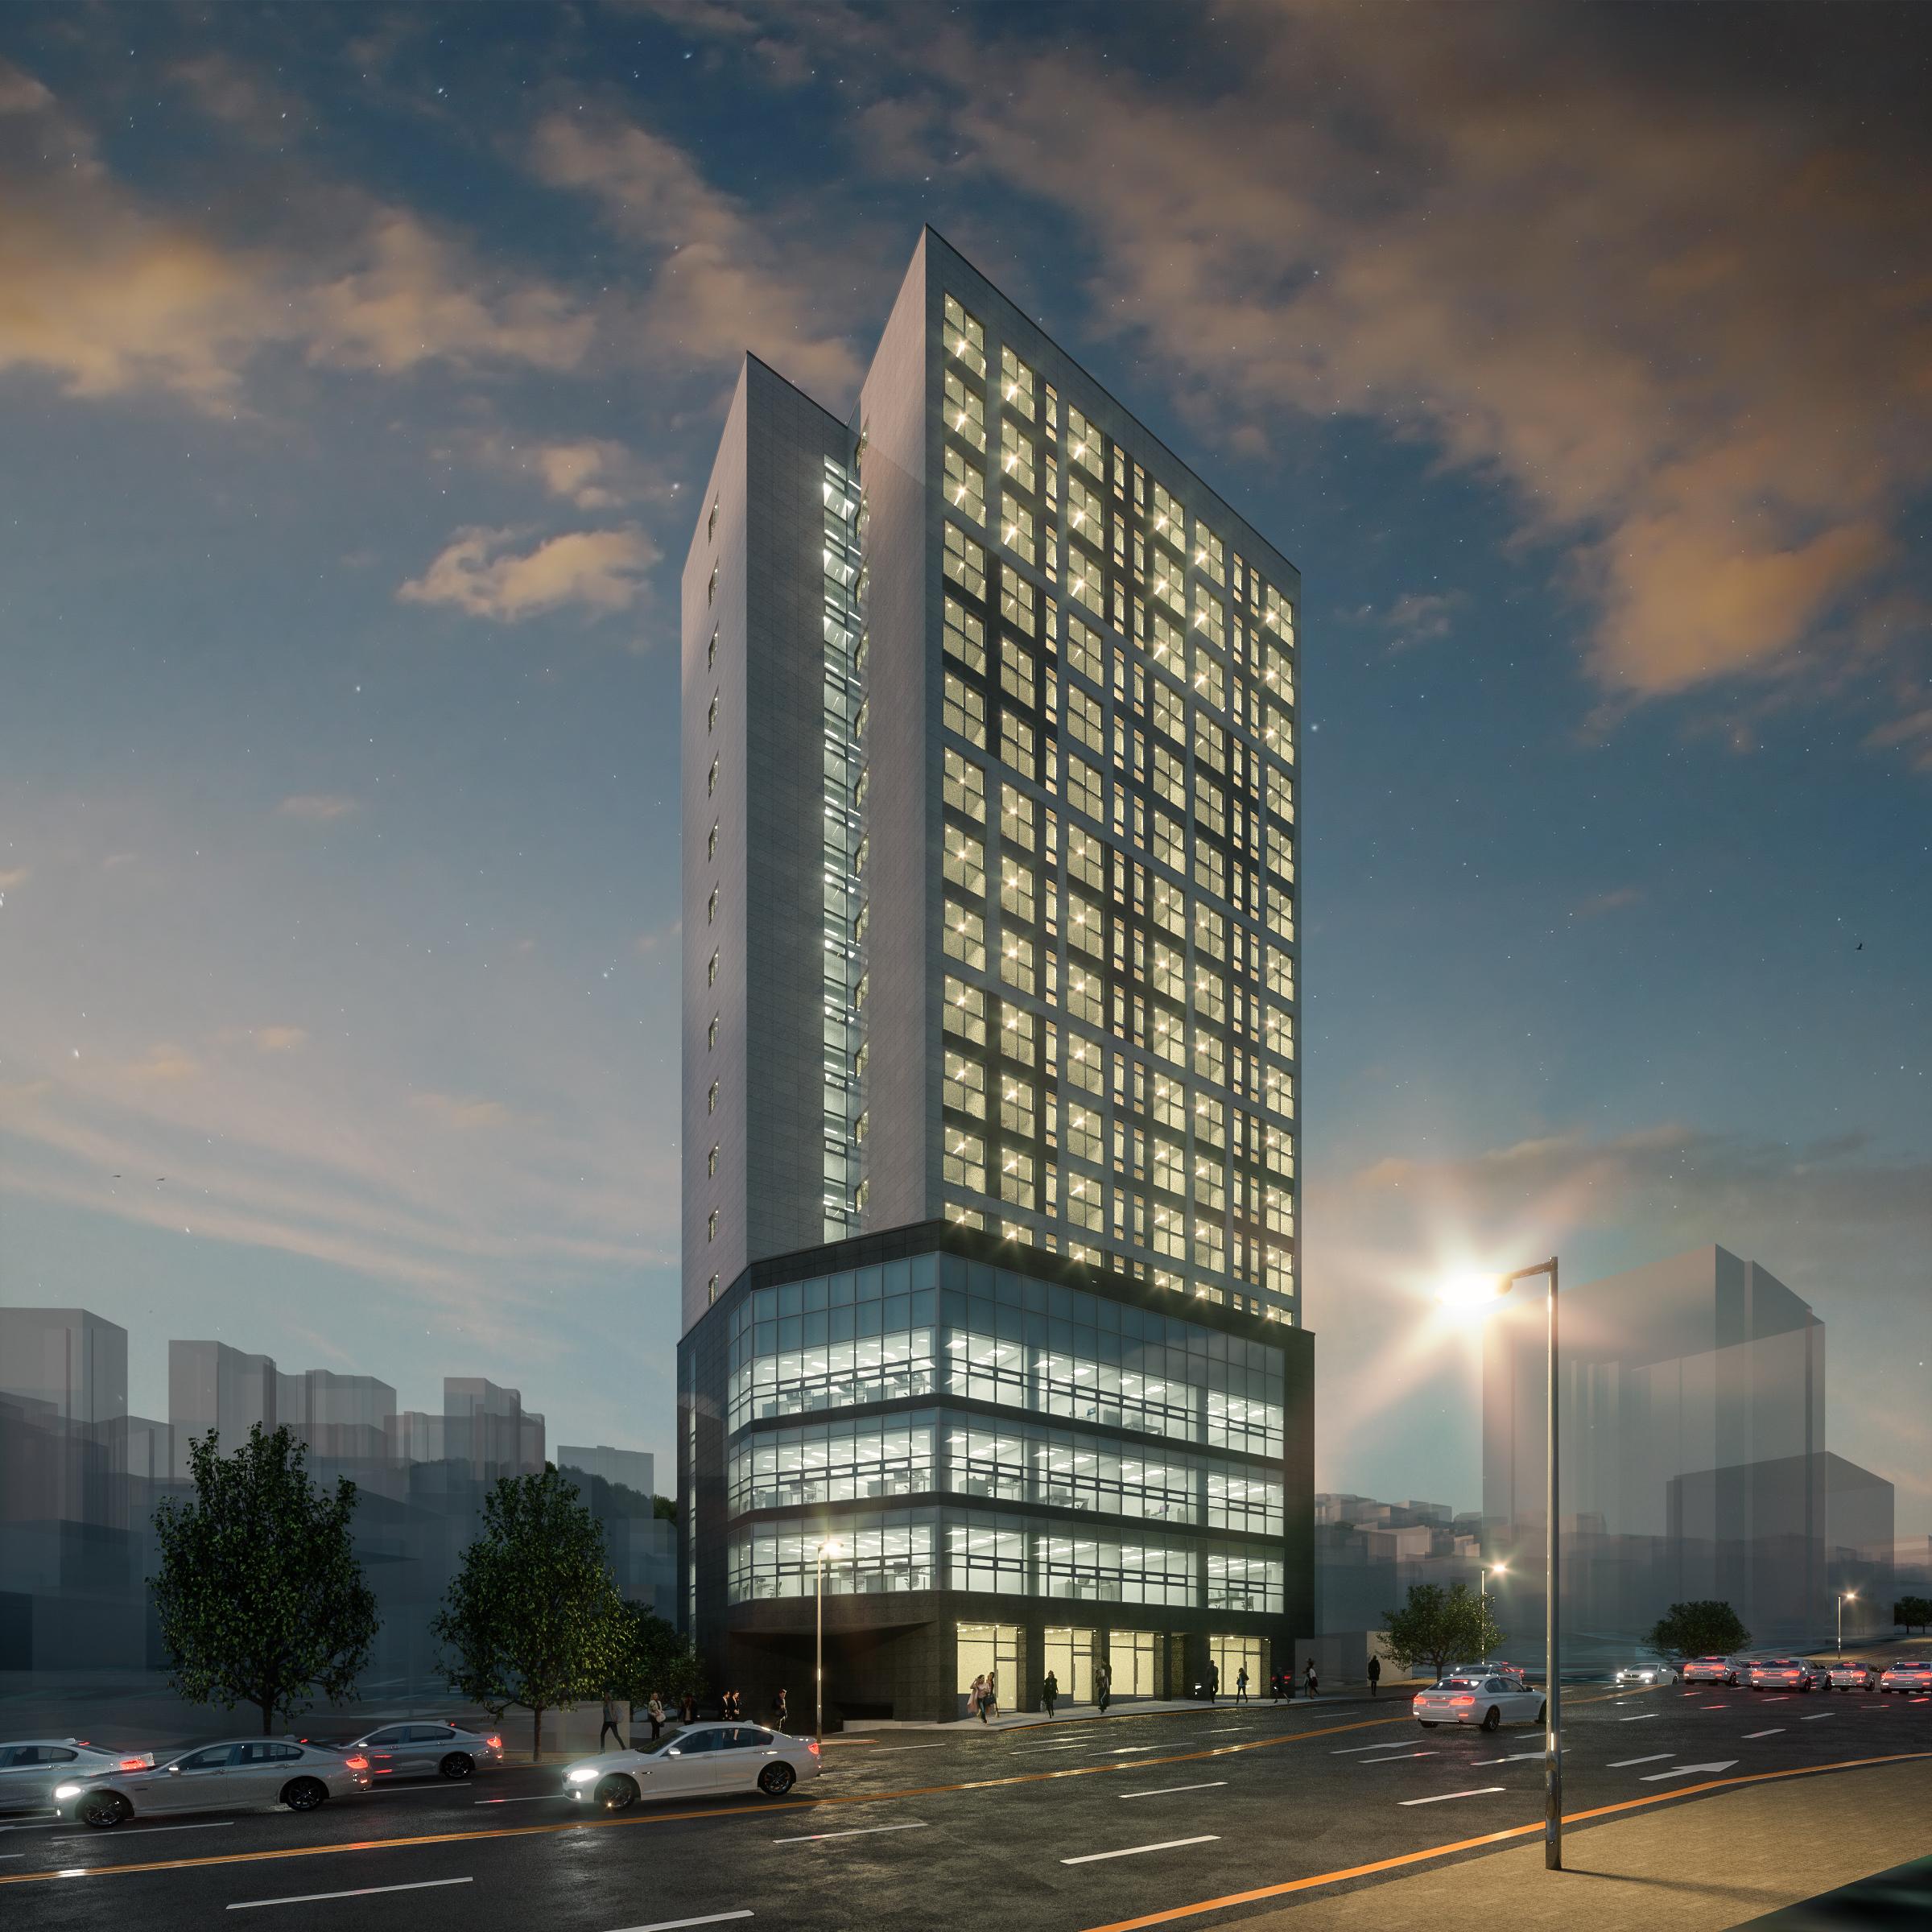 Cheolsan Building